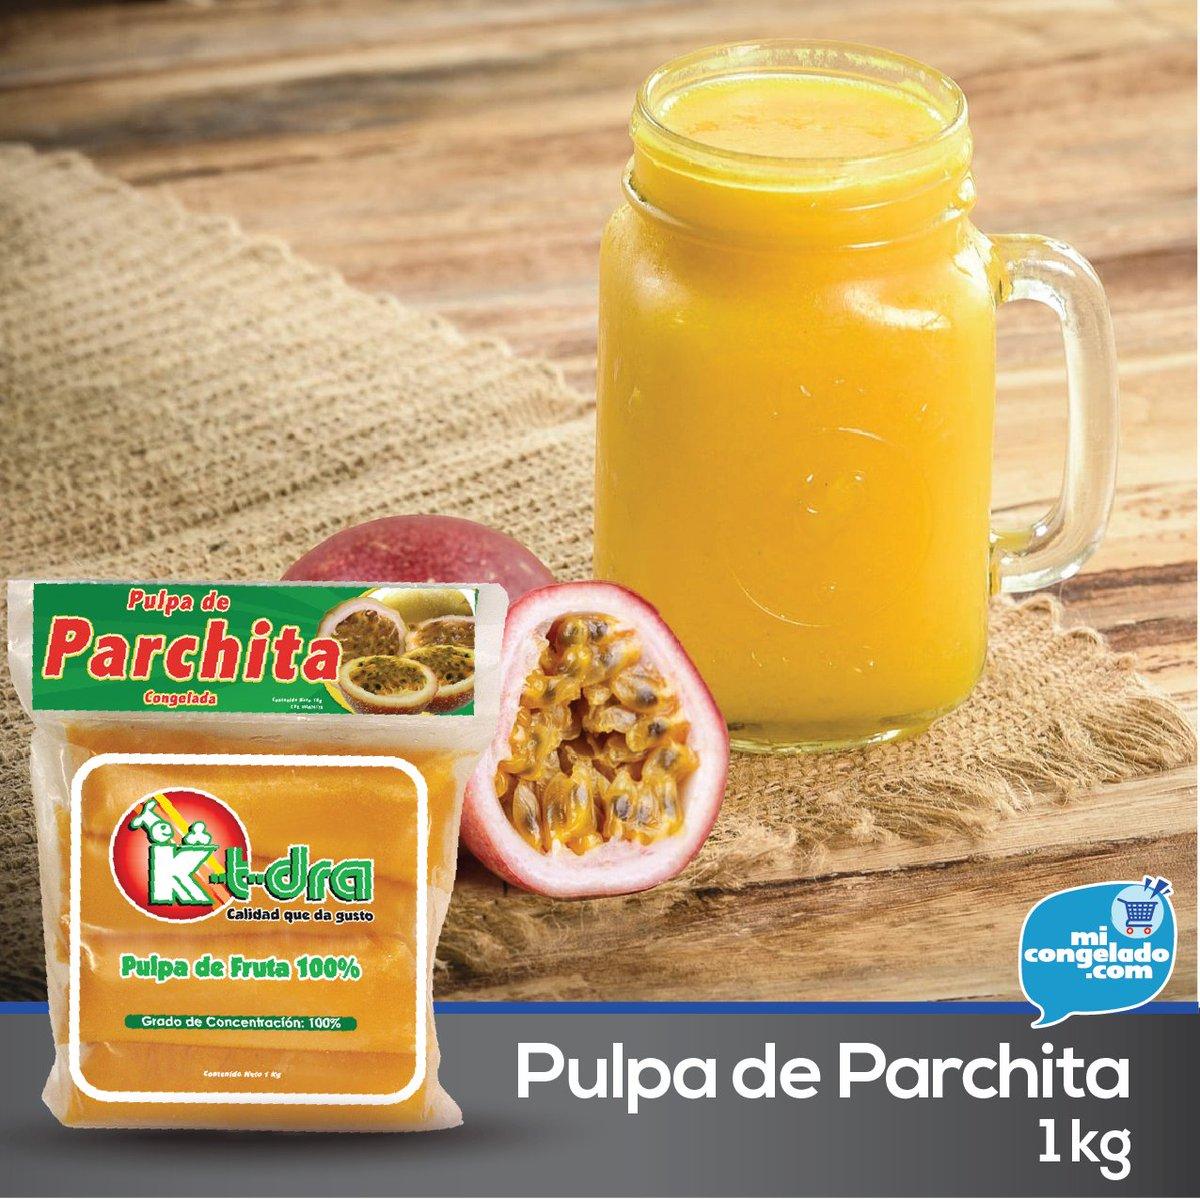 Pulpa de Parchita 100% natural - 1 kg  Disponible Pedidos vía WhatsApp —— #Ktdra #PulpadeFruta #Parchita #Congelada #Micongelado #Delivery #Caracas https://t.co/Lb3dMfrxqr